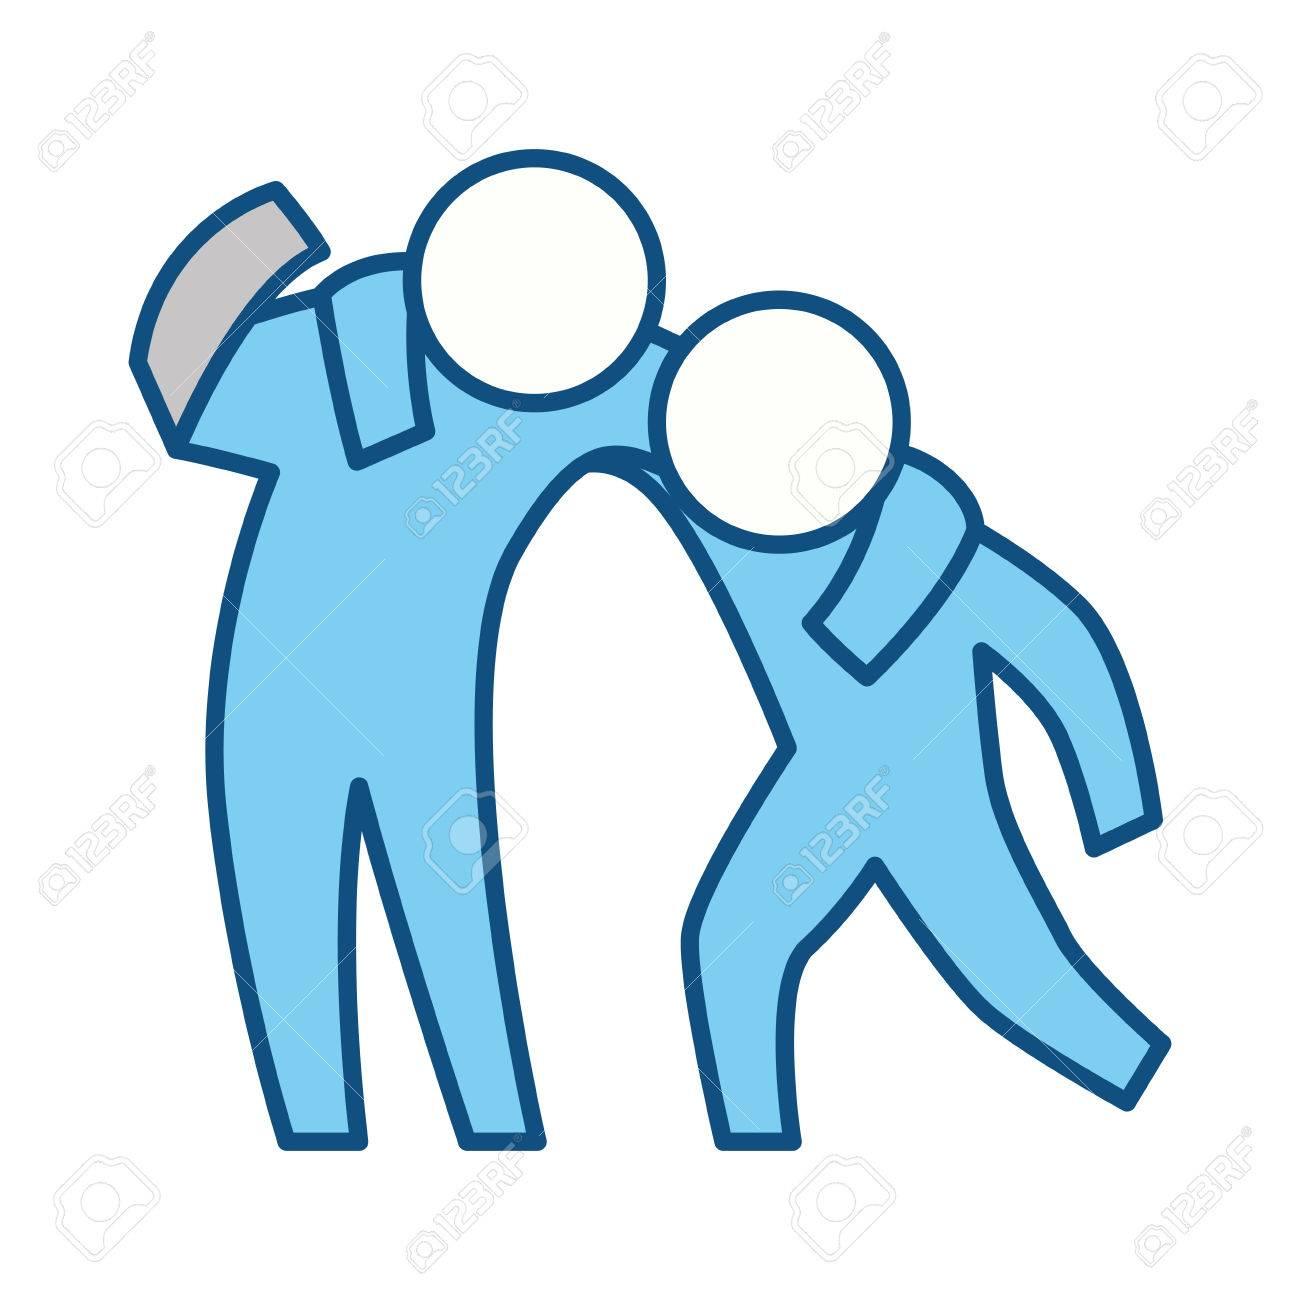 Person helping someone icon vector illustration graphic design.